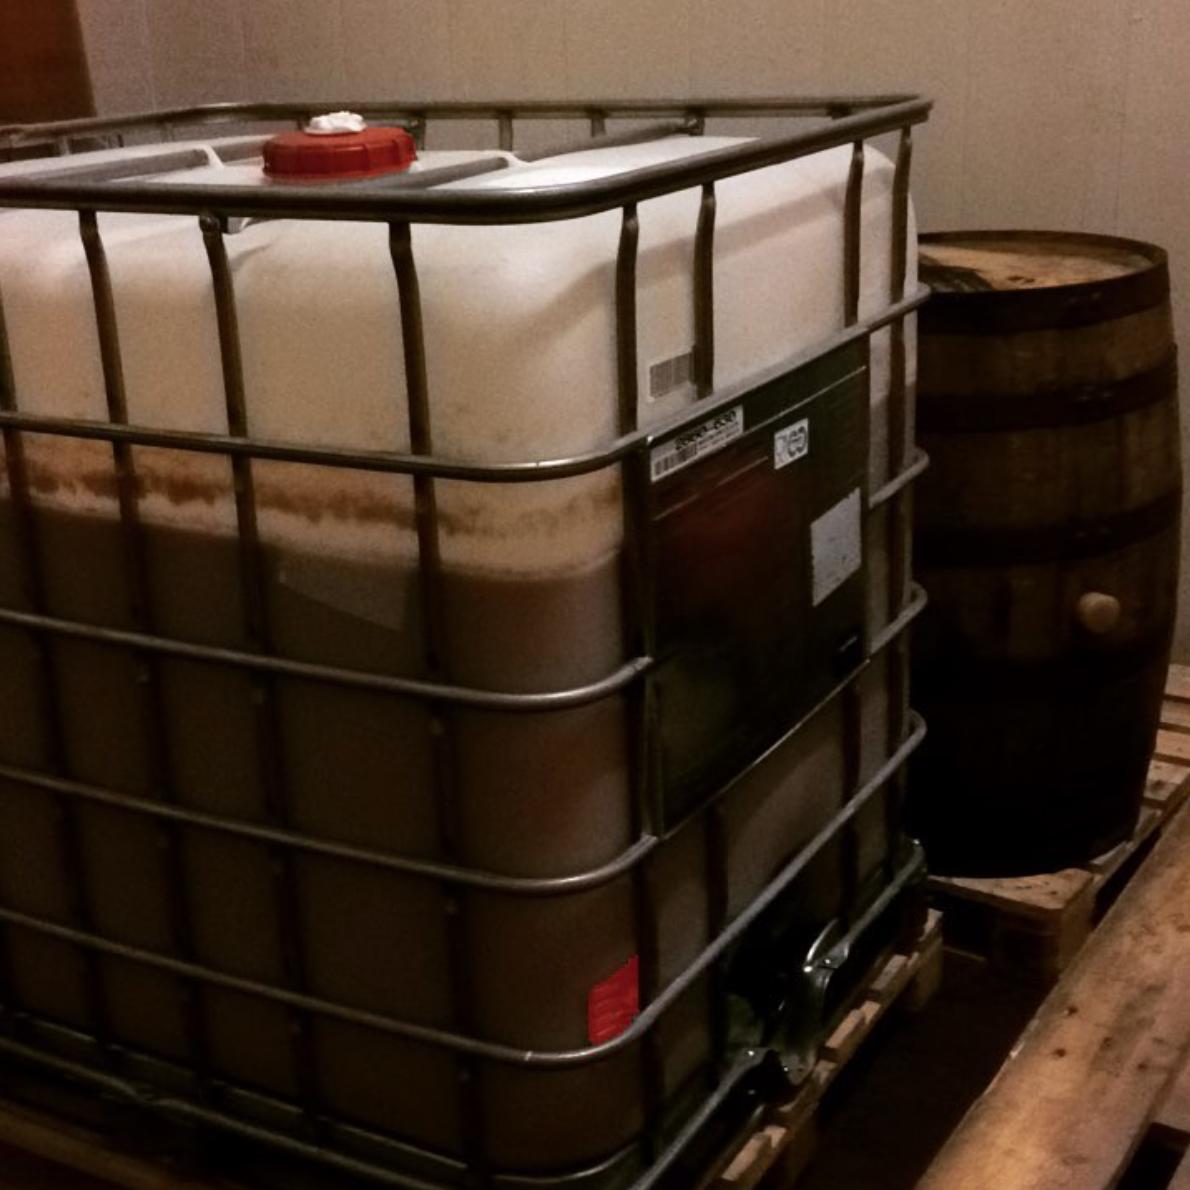 6 - Alcoholic fermentation